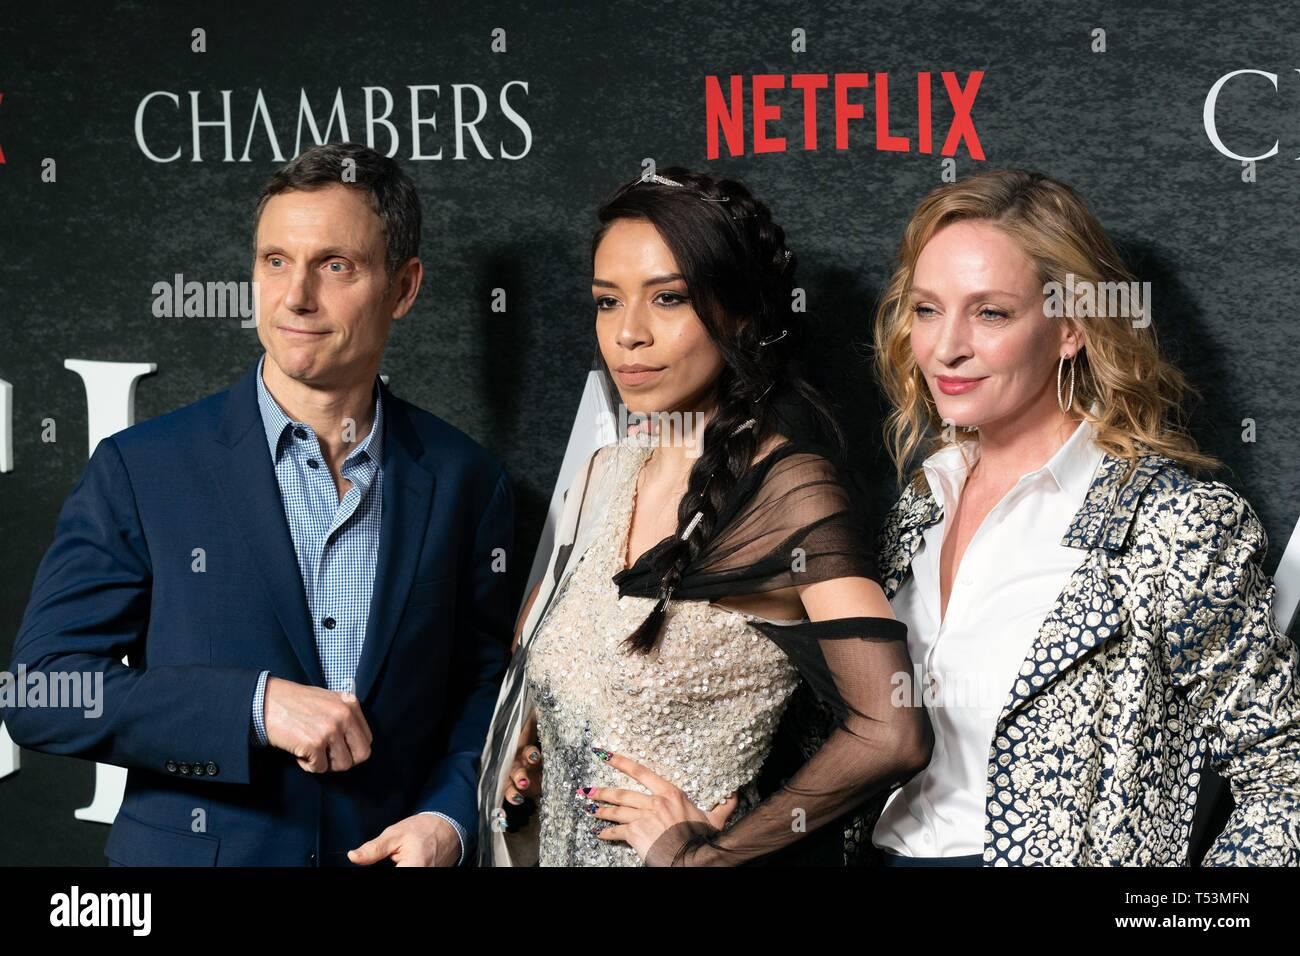 NEW YORK, NY - APRIL 15: Tony Goldwyn, Sivan Alyra Rose and Uma Thurman attend Netflix's 'Chambers' Season 1 New York Premiere at Metrograph on April  - Stock Image